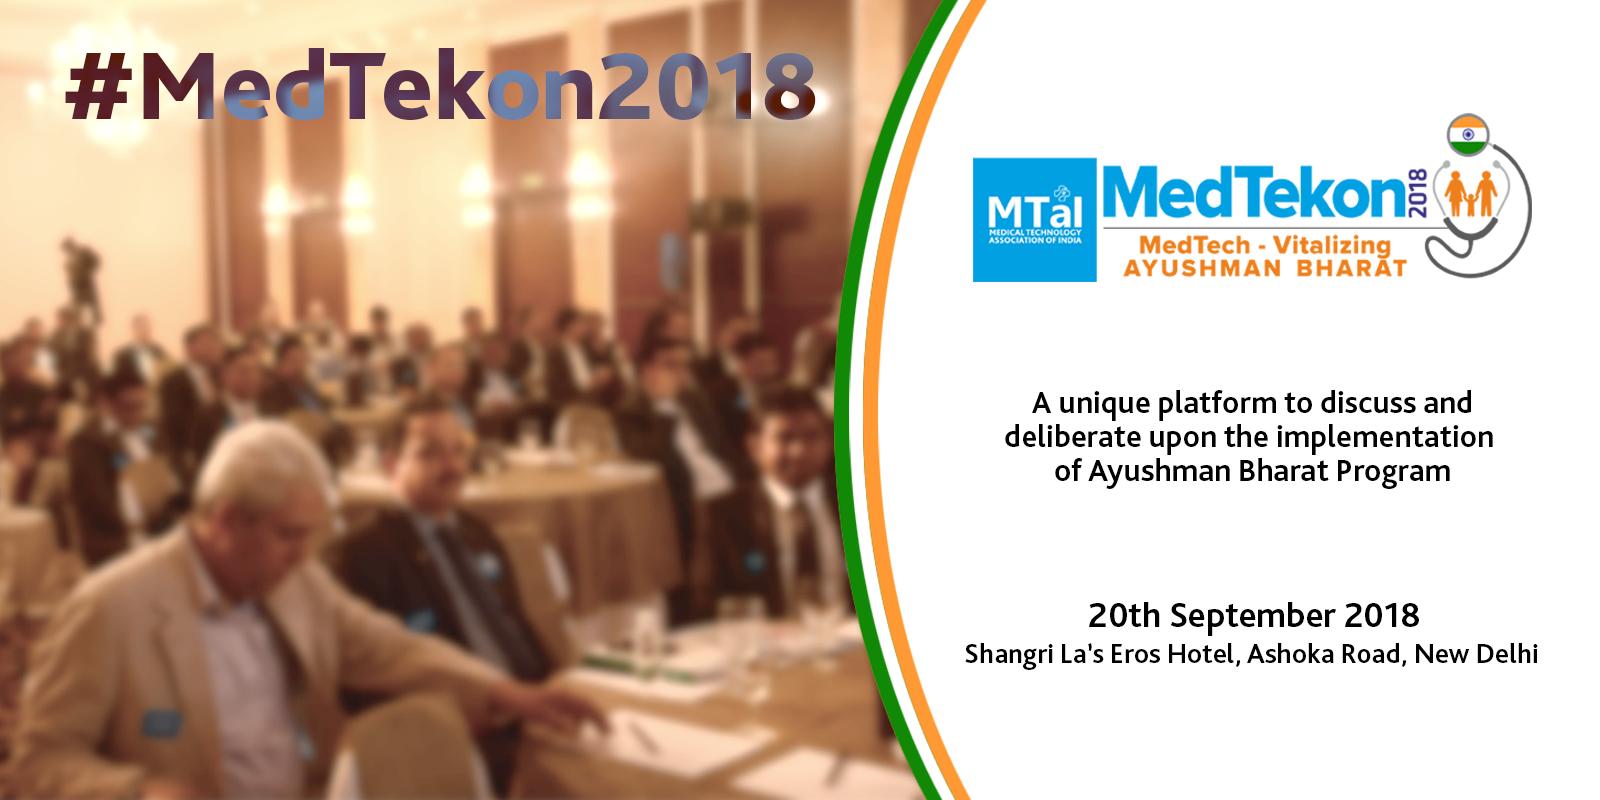 MTaI MedTekon 2018: MedTech - Vitalizing Ayushman Bharat